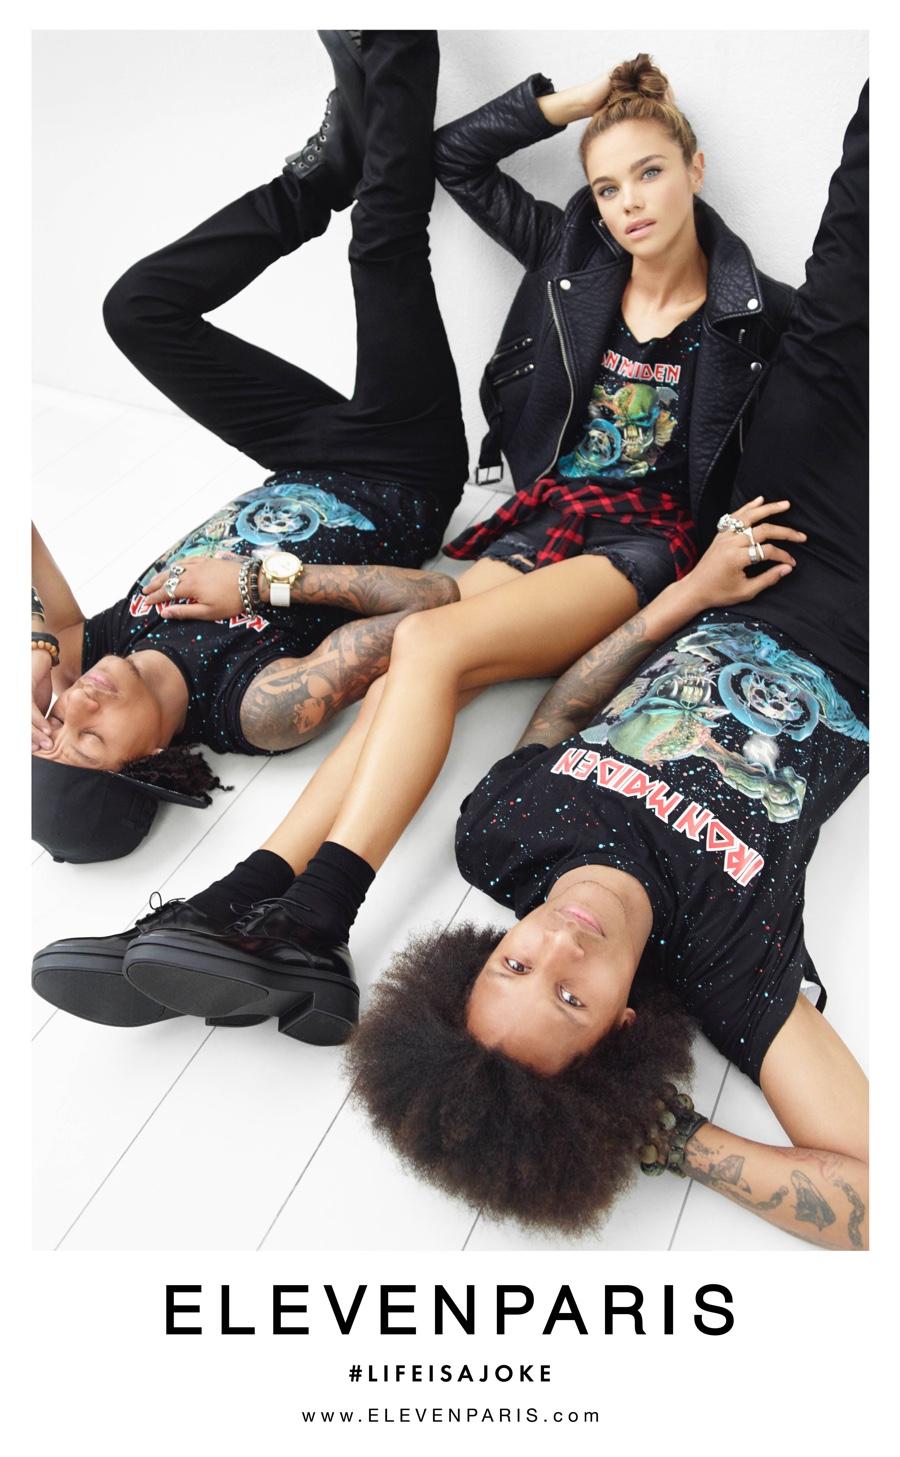 Eleven Paris x Les Twins for Fall/Winter 2015 Campaign